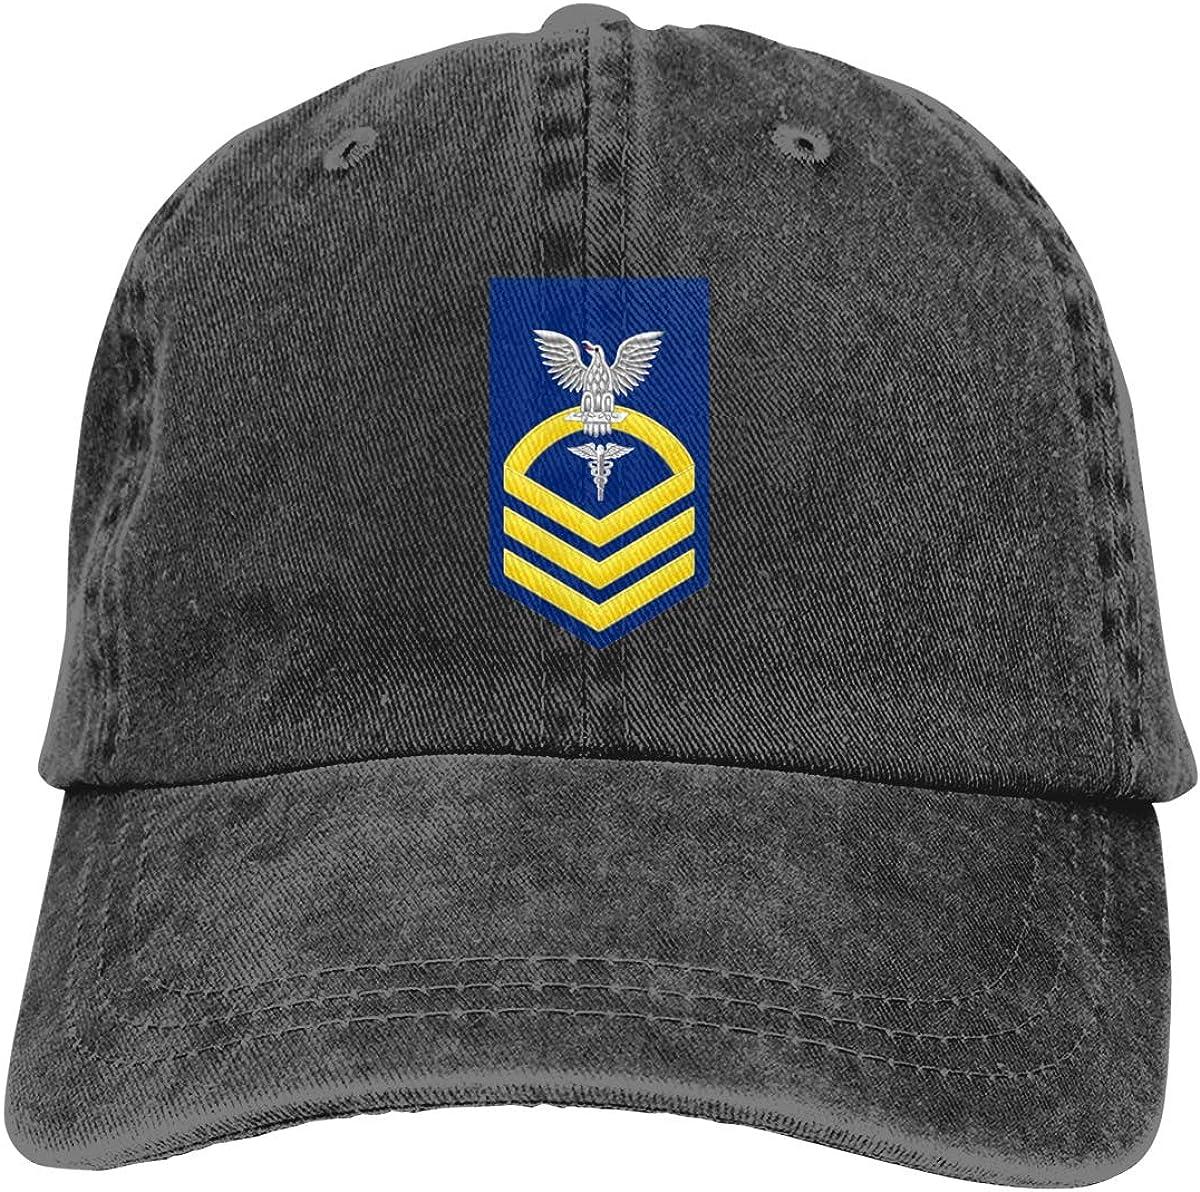 U.S Navy Chief Gold E-7 Hospital Officer HM Military Cap Women Men Baseball Hat Adjustable